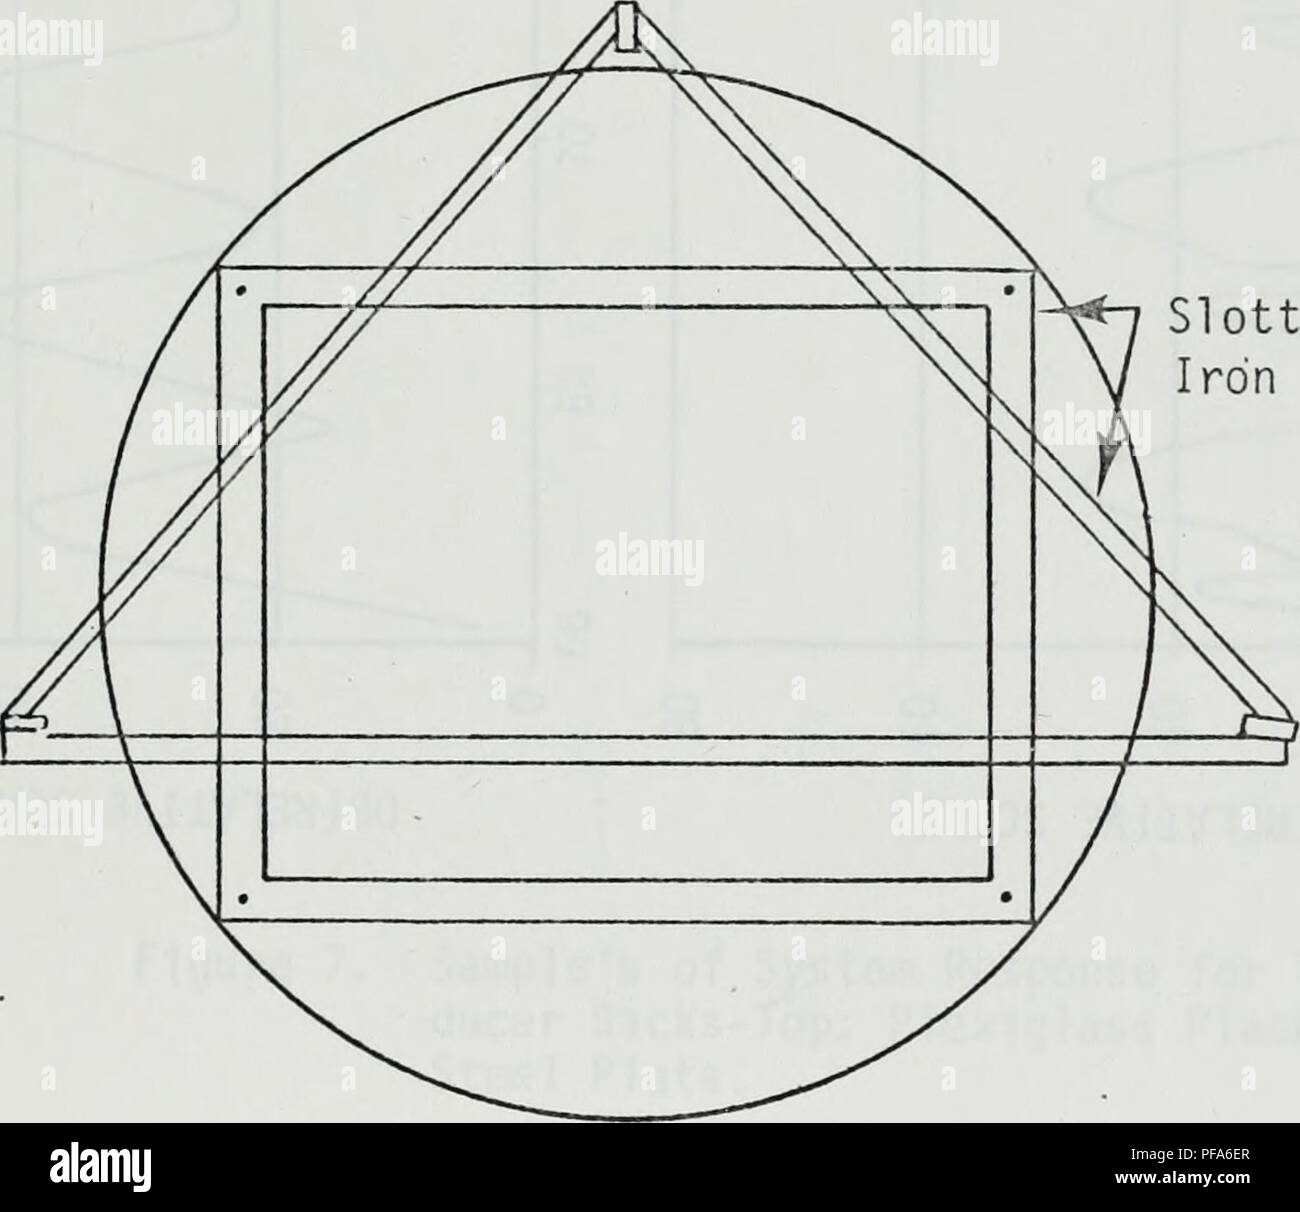 reflectors stock photos reflectors stock images alamy. Black Bedroom Furniture Sets. Home Design Ideas